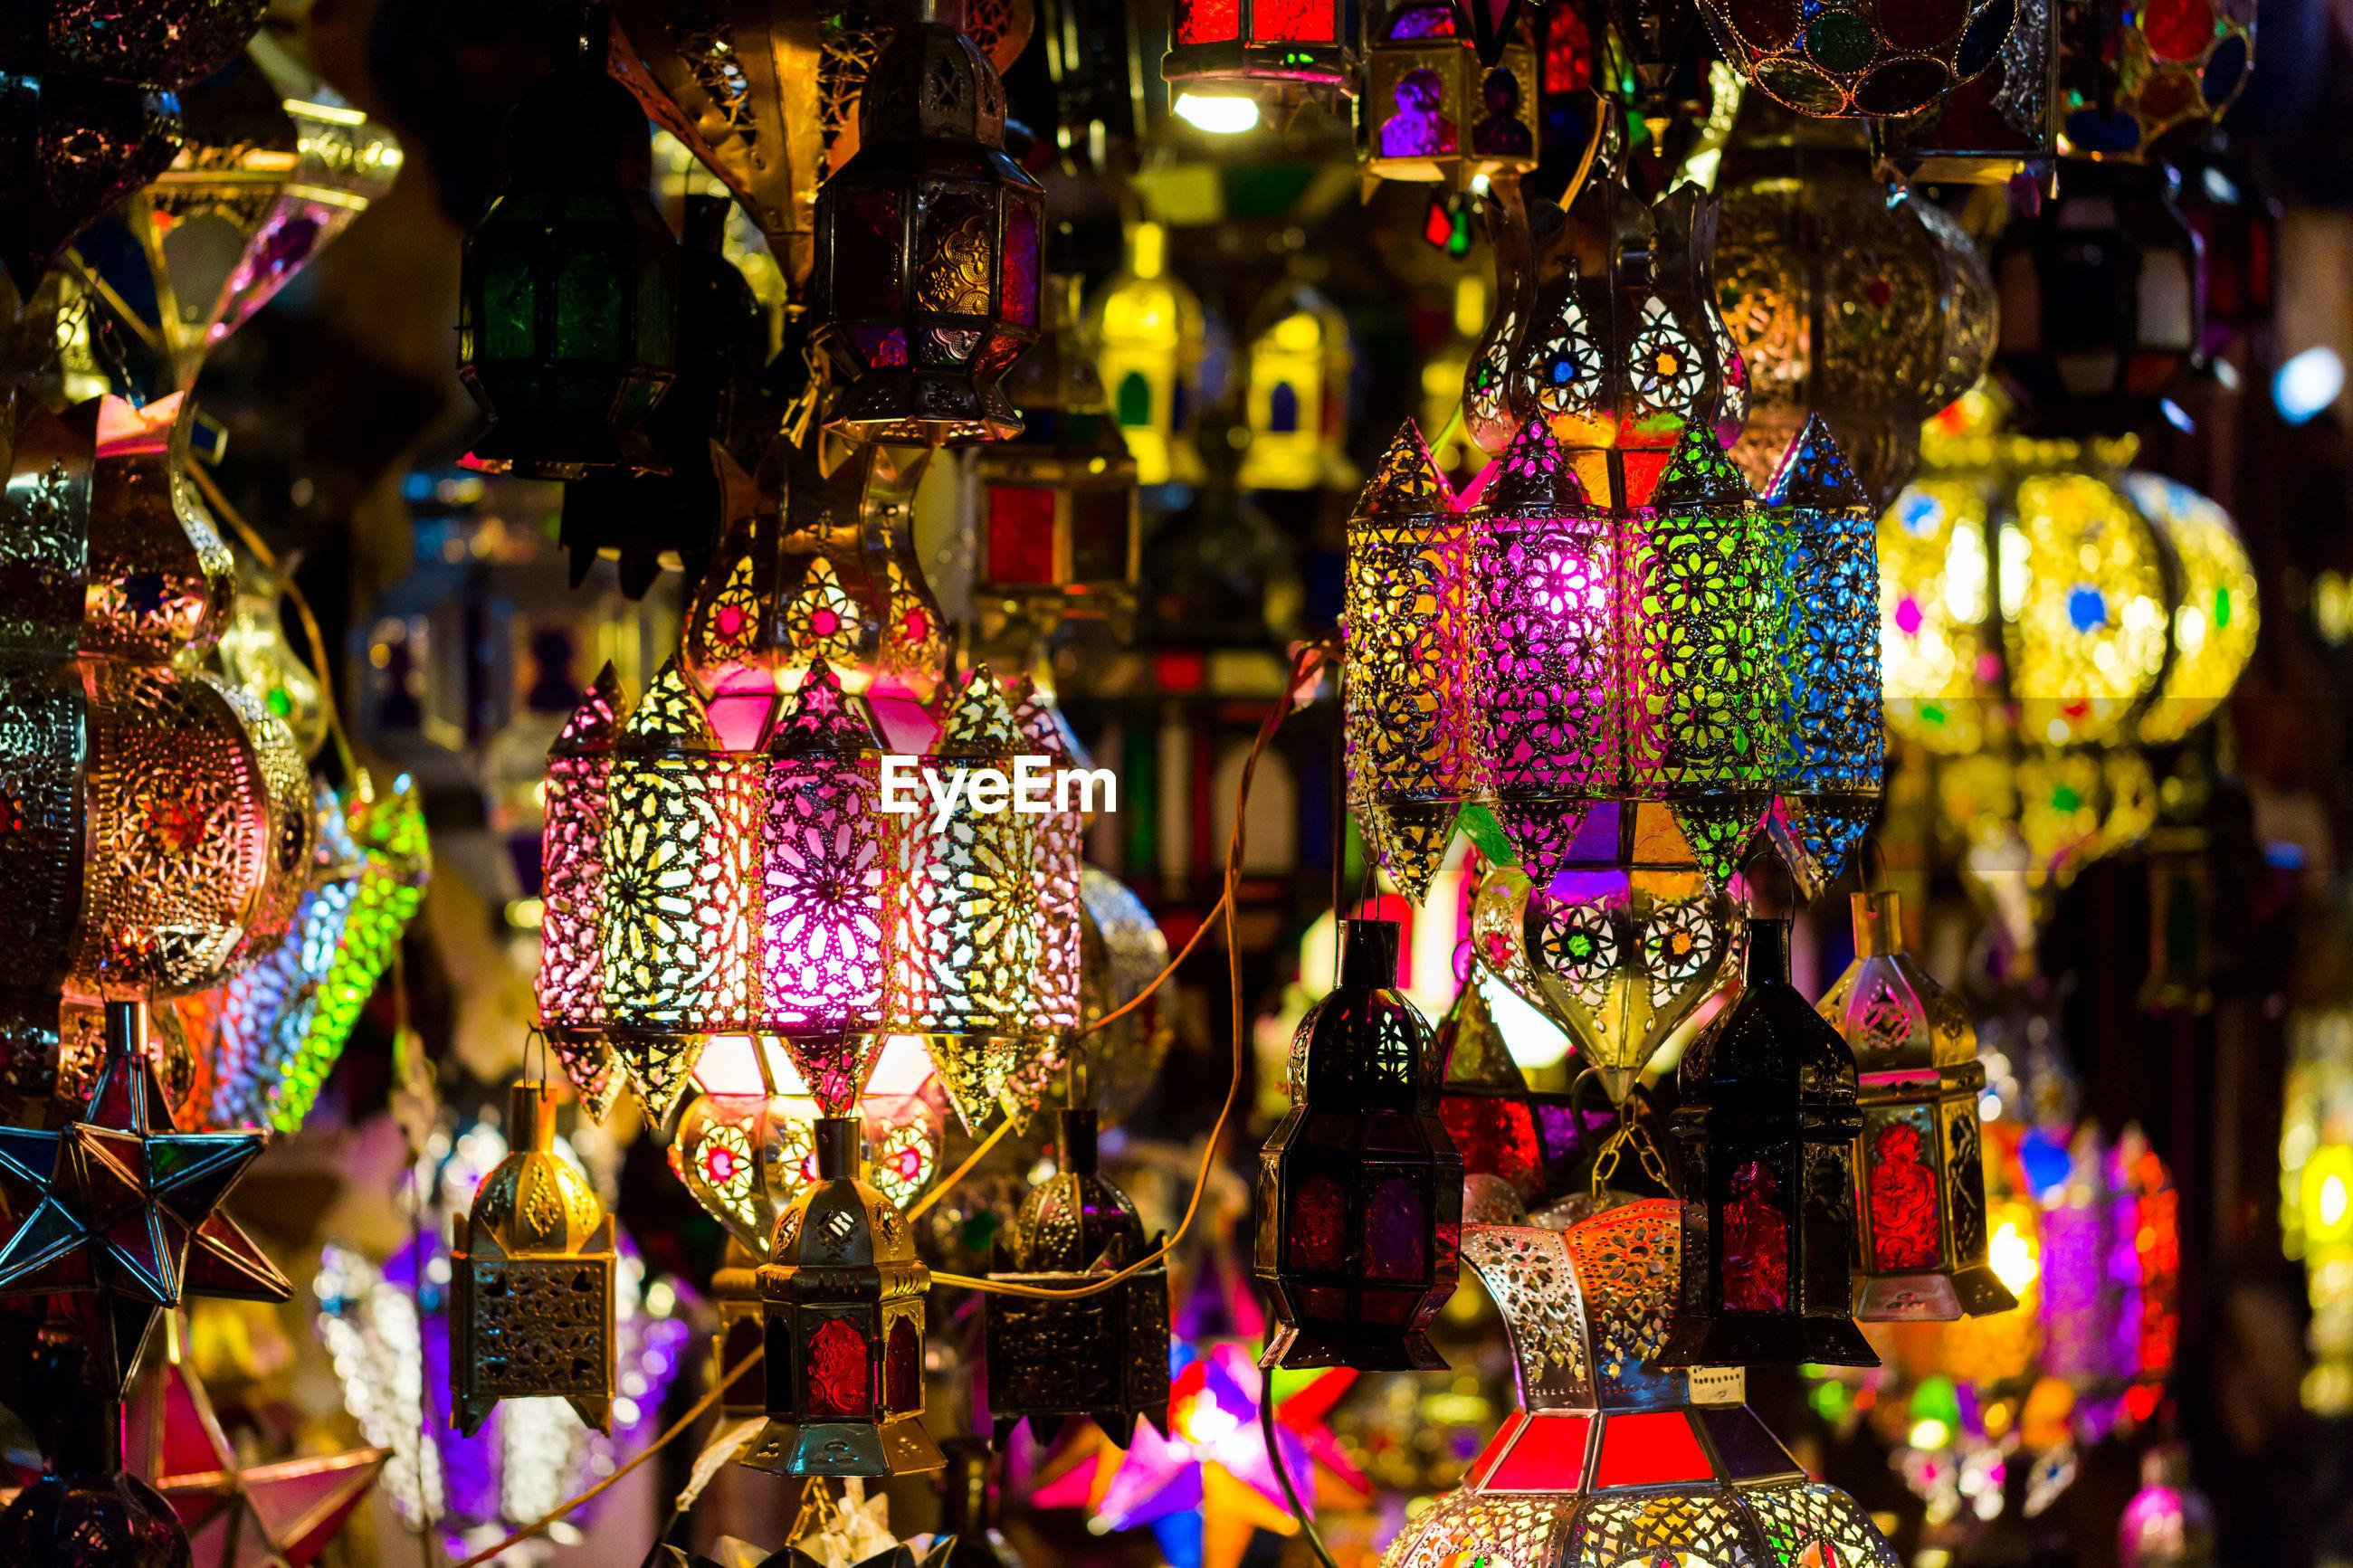 Illuminated lanterns hanging at market for sale during night